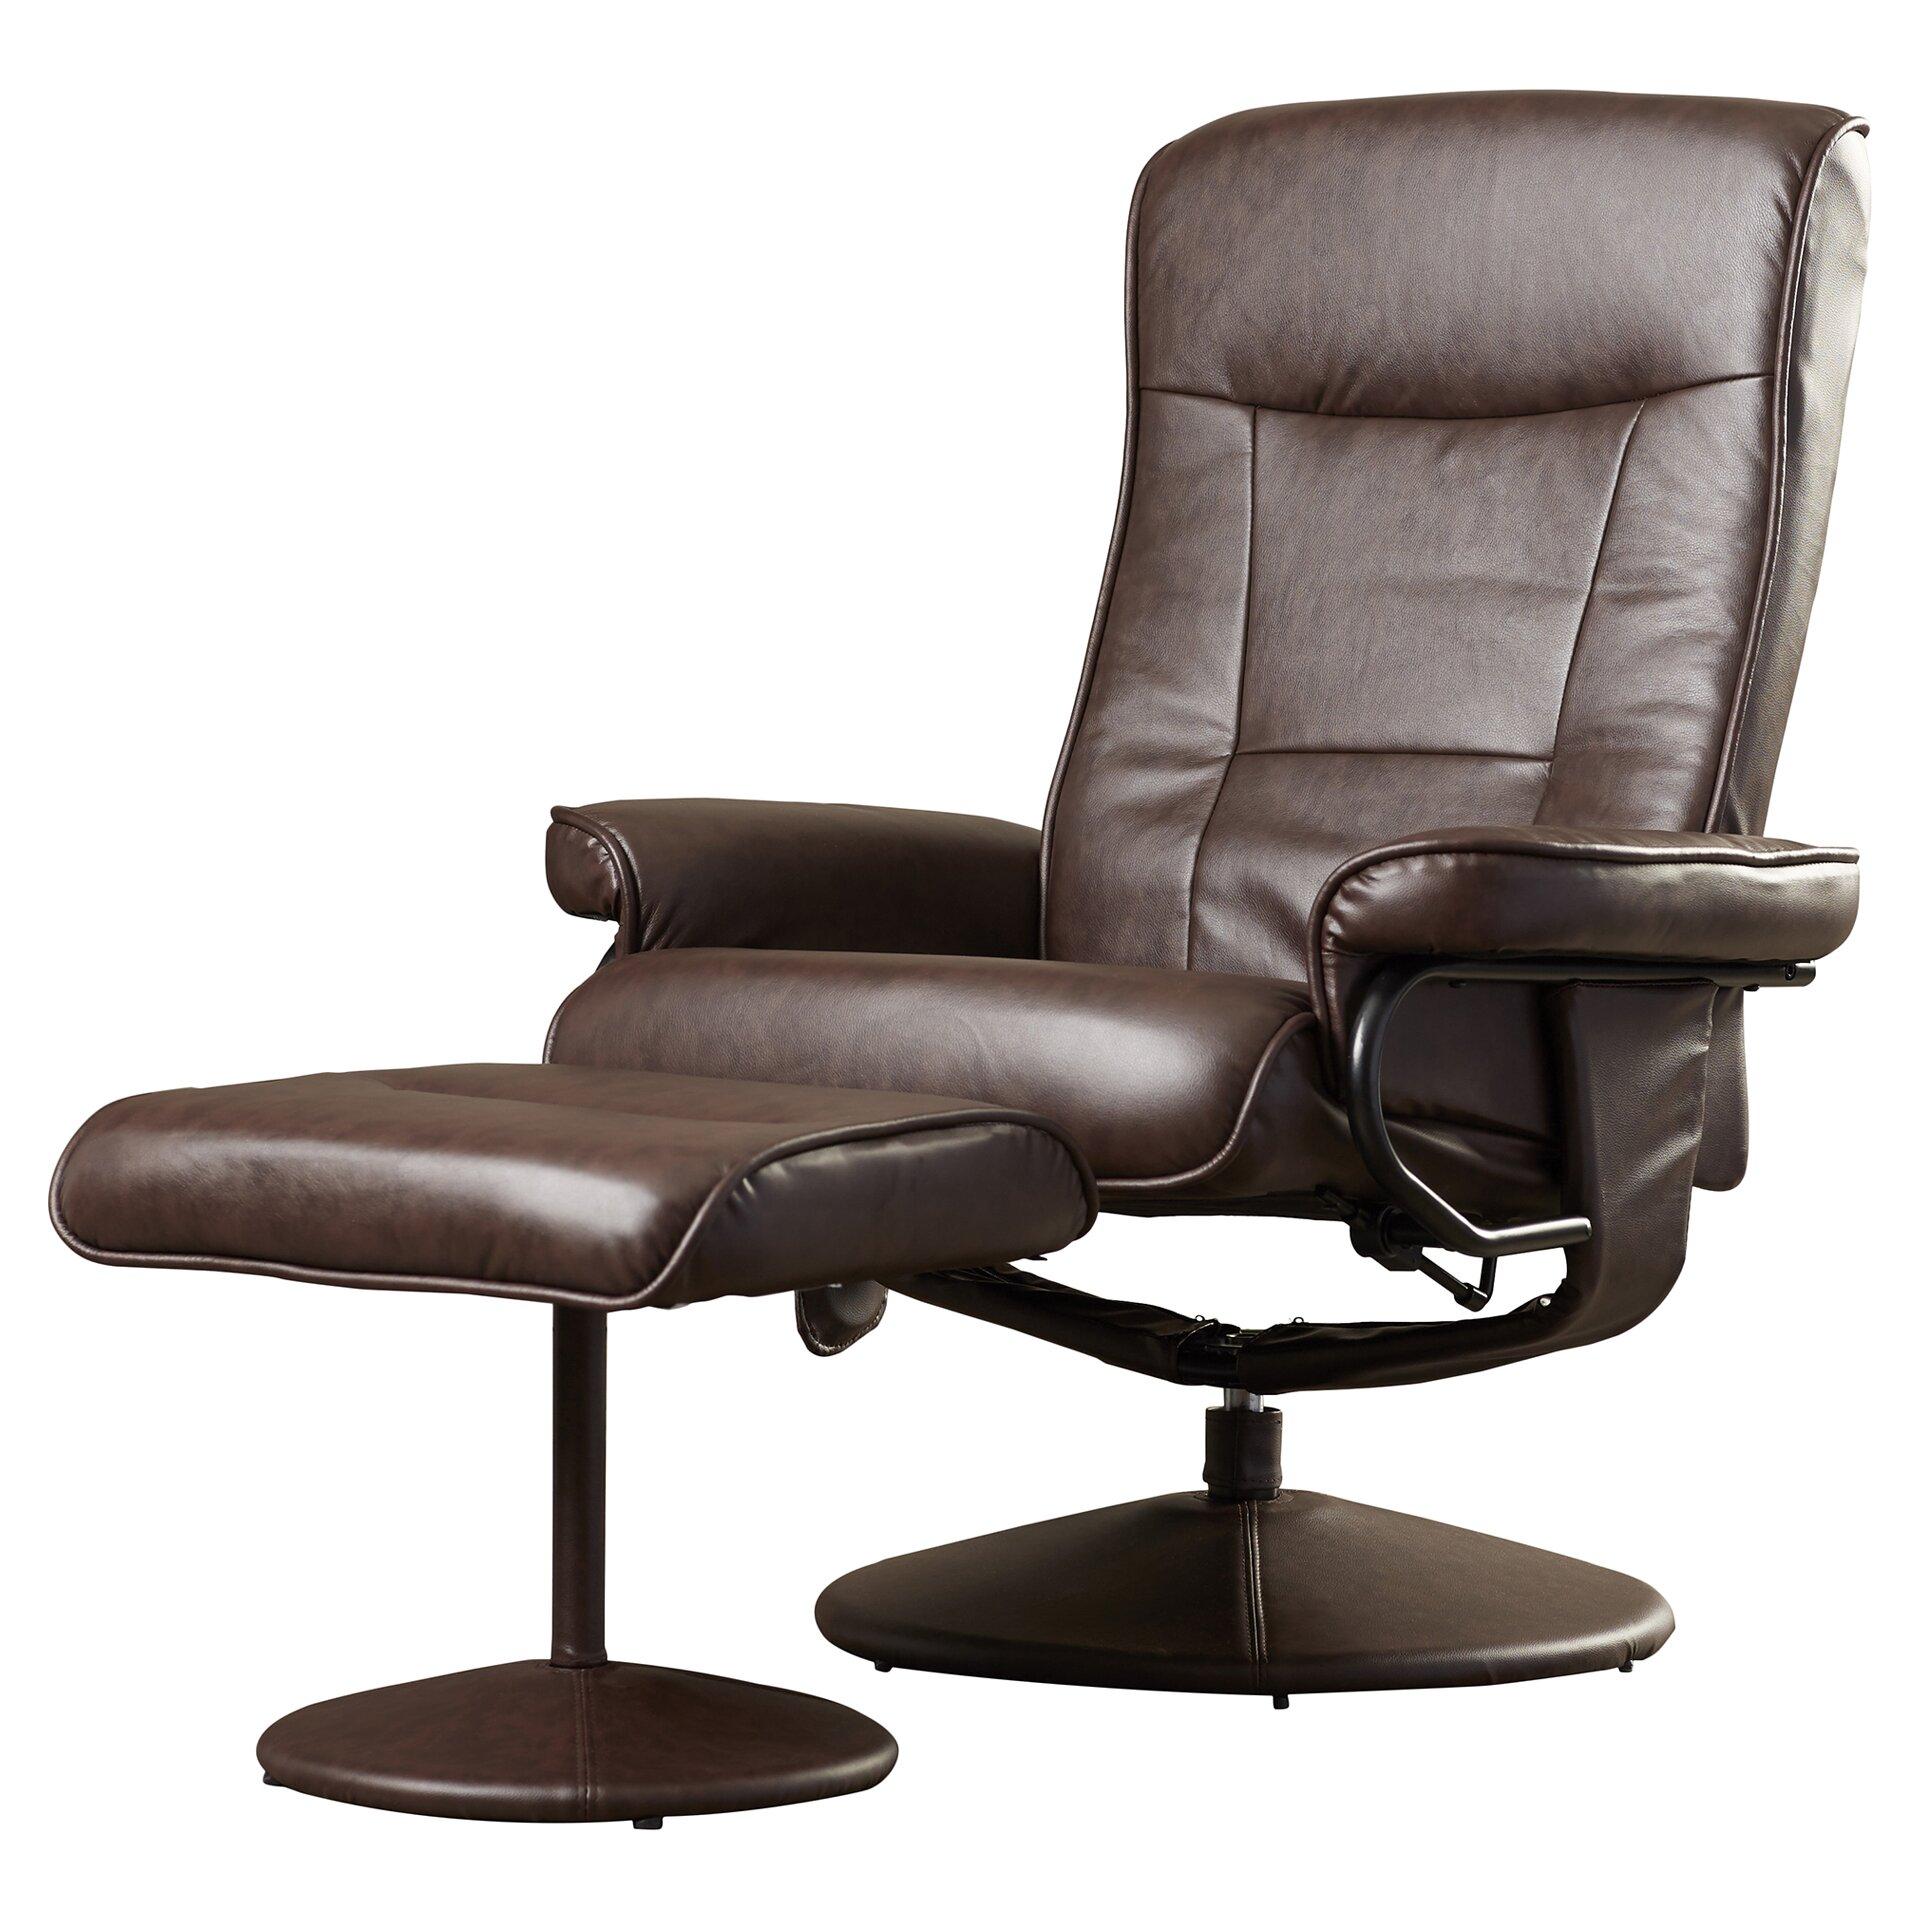 Heated Office Chair Cushion Canada Home Design